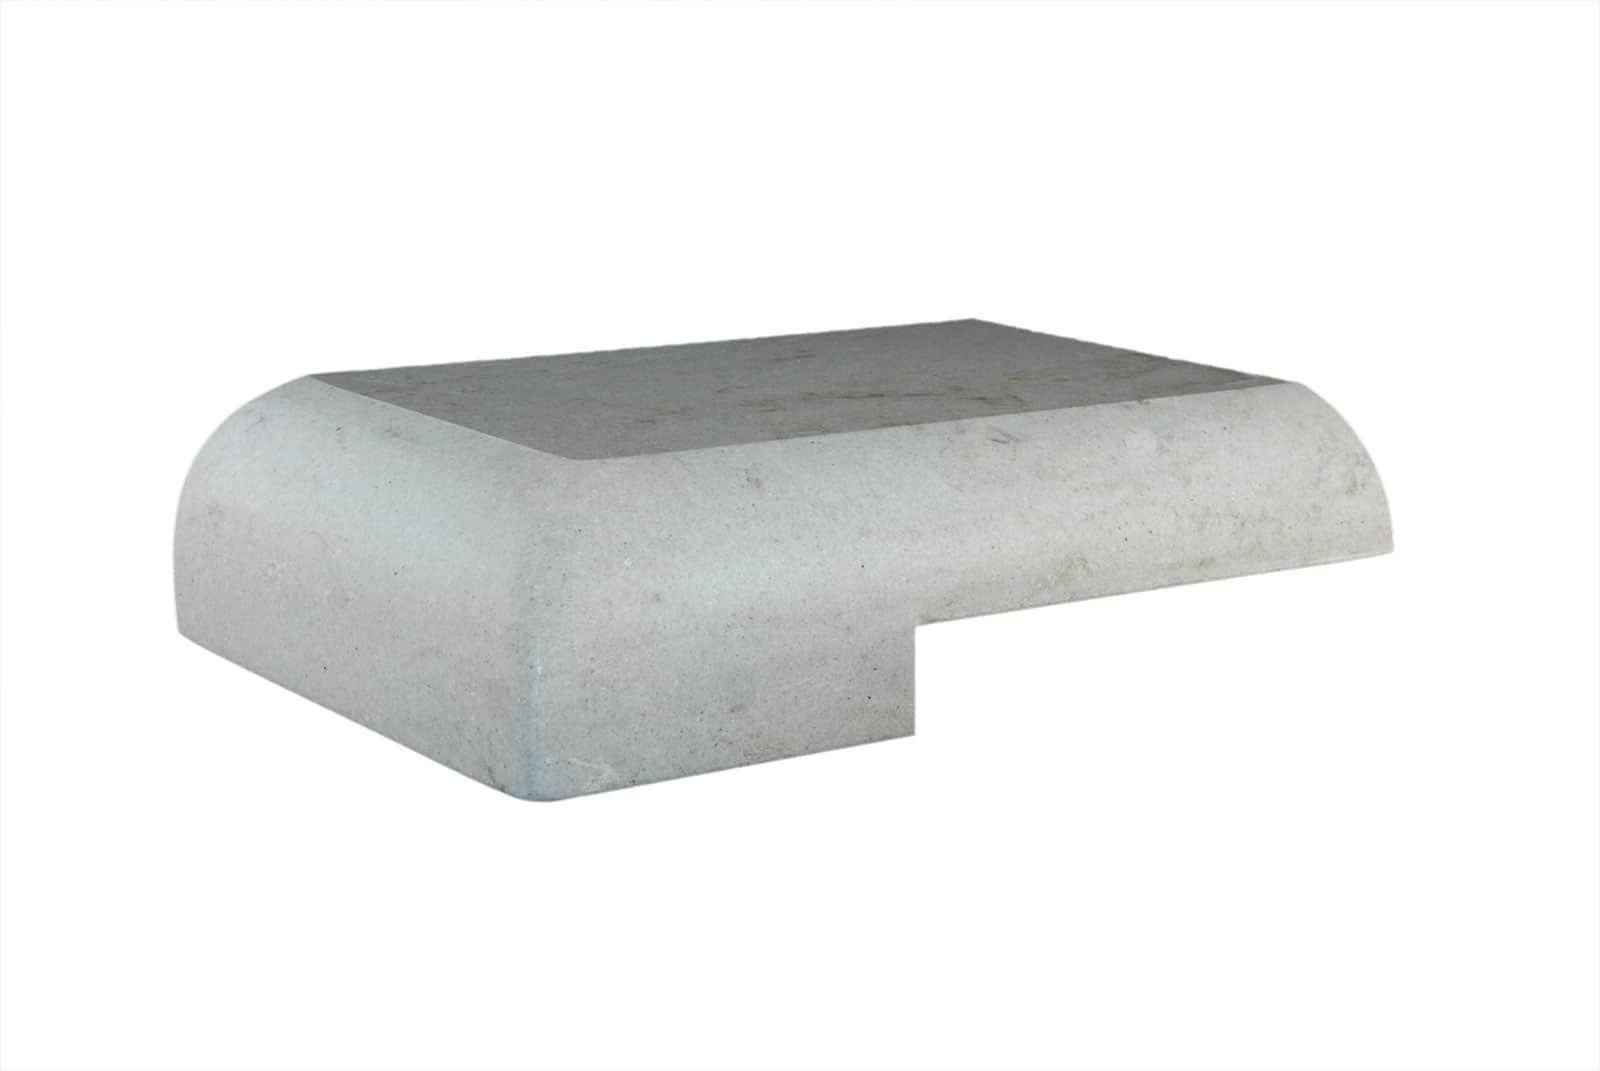 artistic-granite-designs-edges-fabrications-1_5-Bullnose-bevel-6070